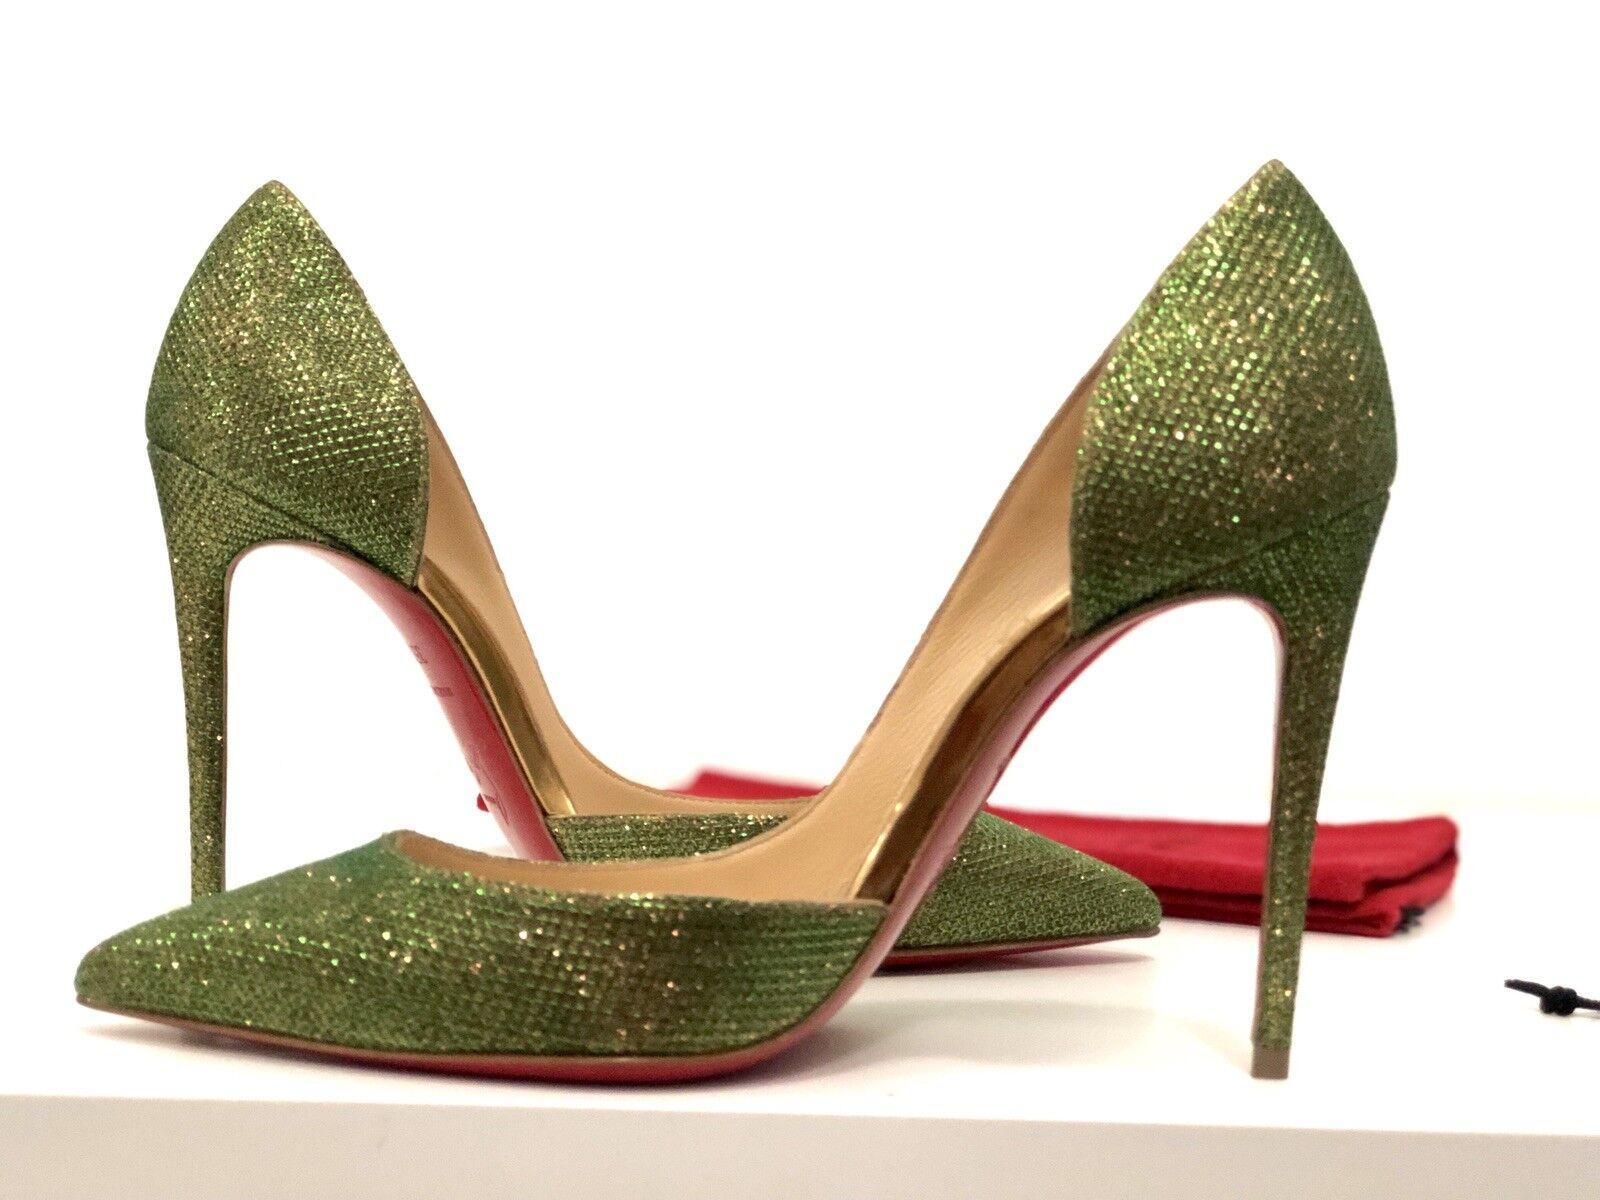 NEW Christian Christian Christian Louboutin Iriza 100 Glitter Shinny gold Holographic Heel 35,5 830d5e